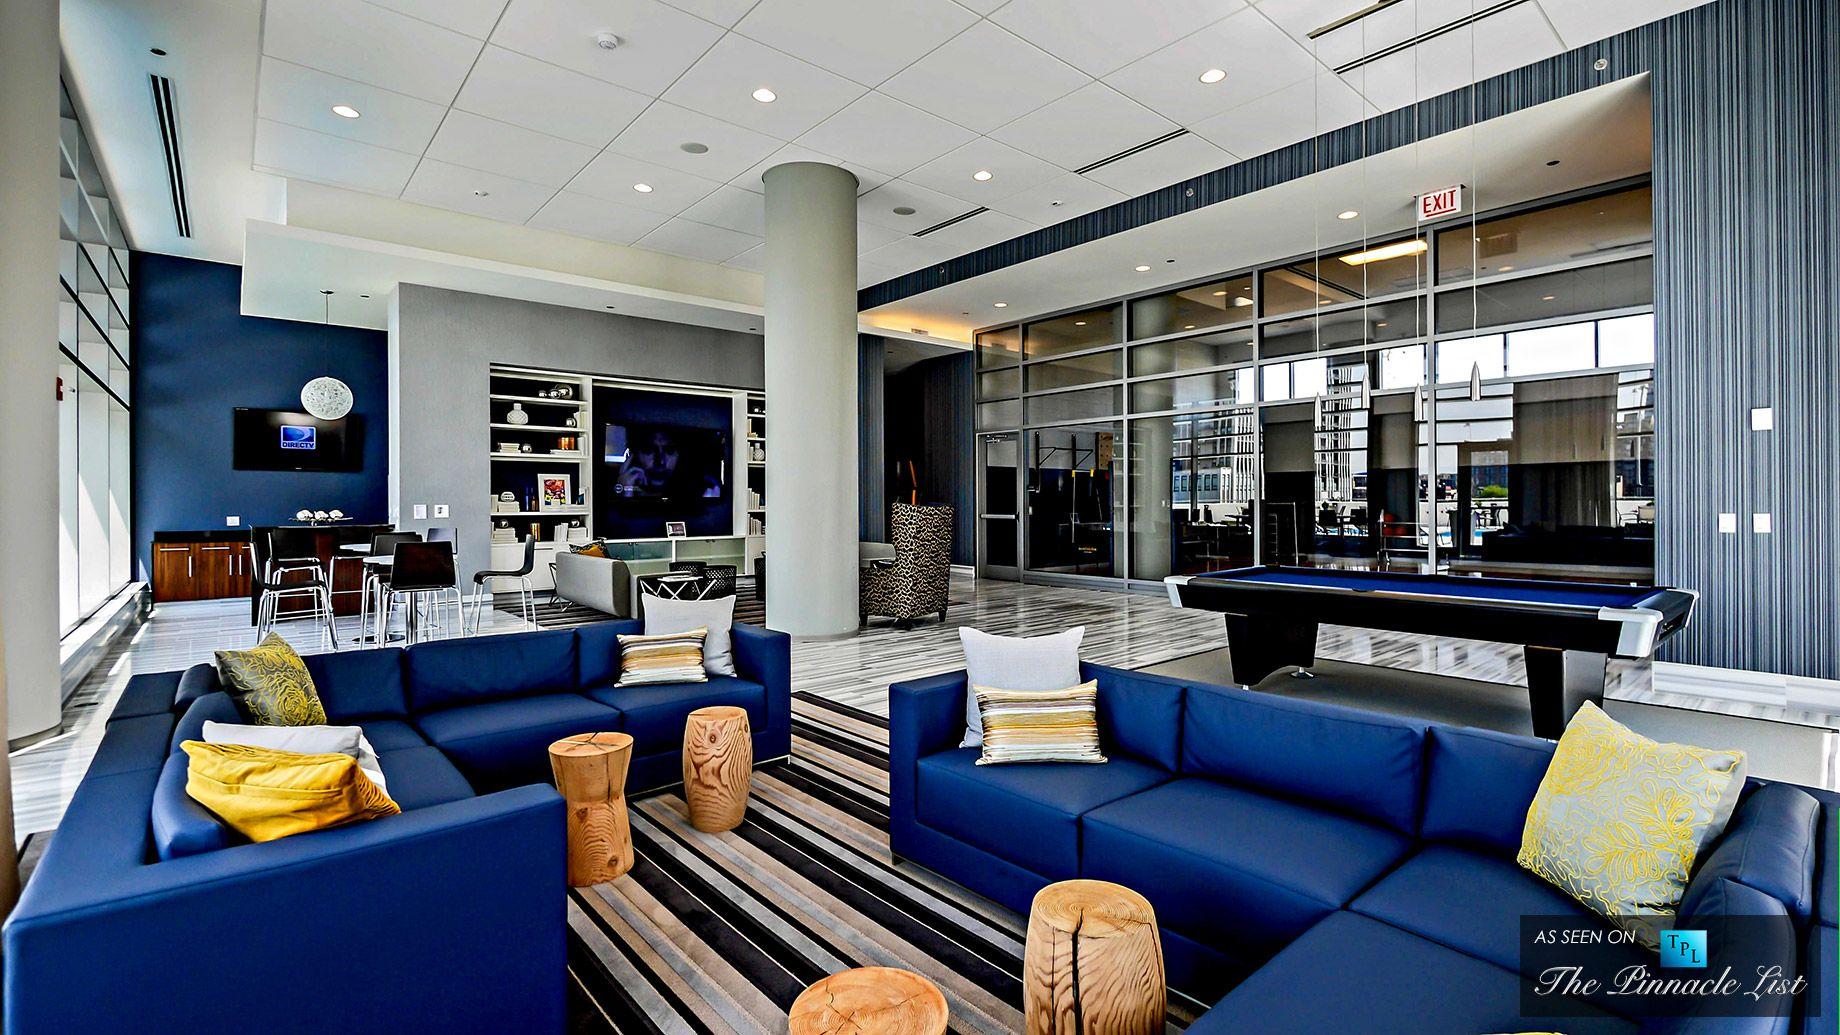 Delightful K2 Luxury Apartment Condominium Tower In Chicago Fulton River District